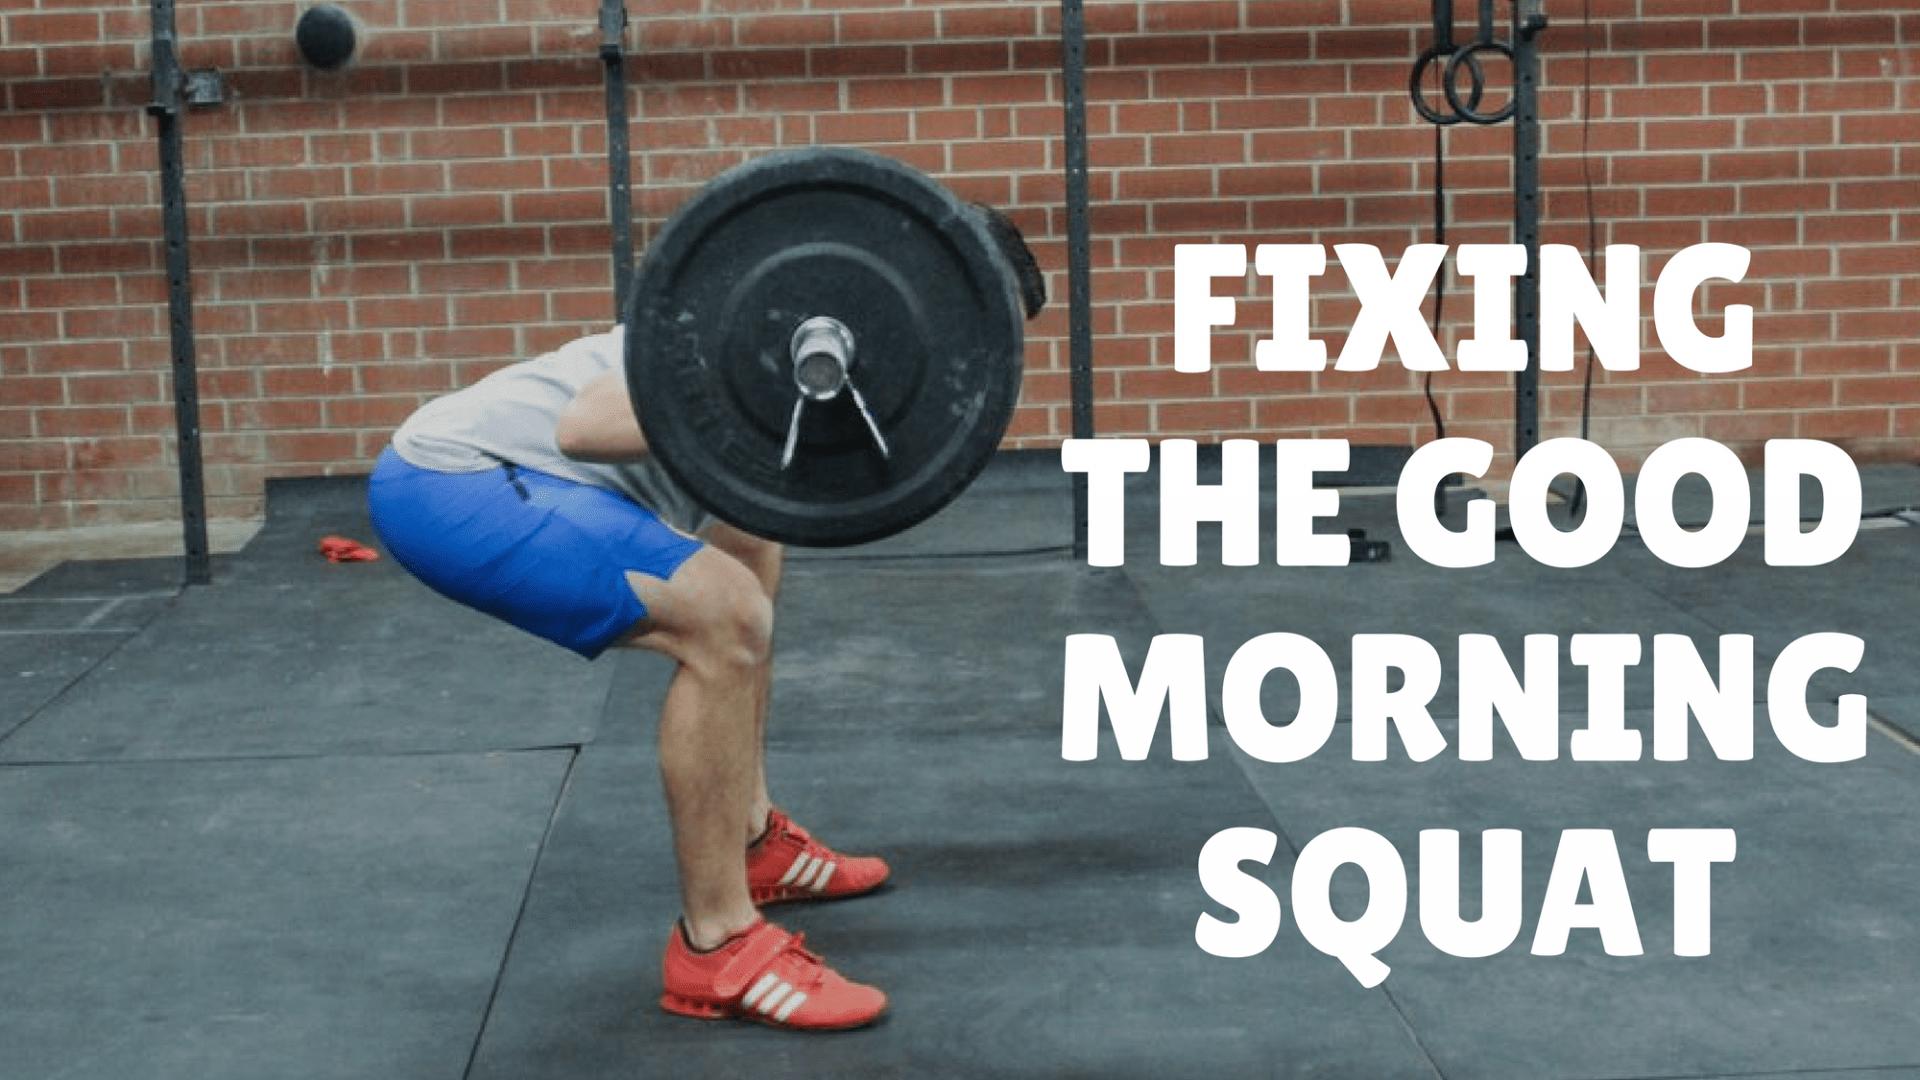 Good Morning Gym : Good morning fitness images workout everydayentropy